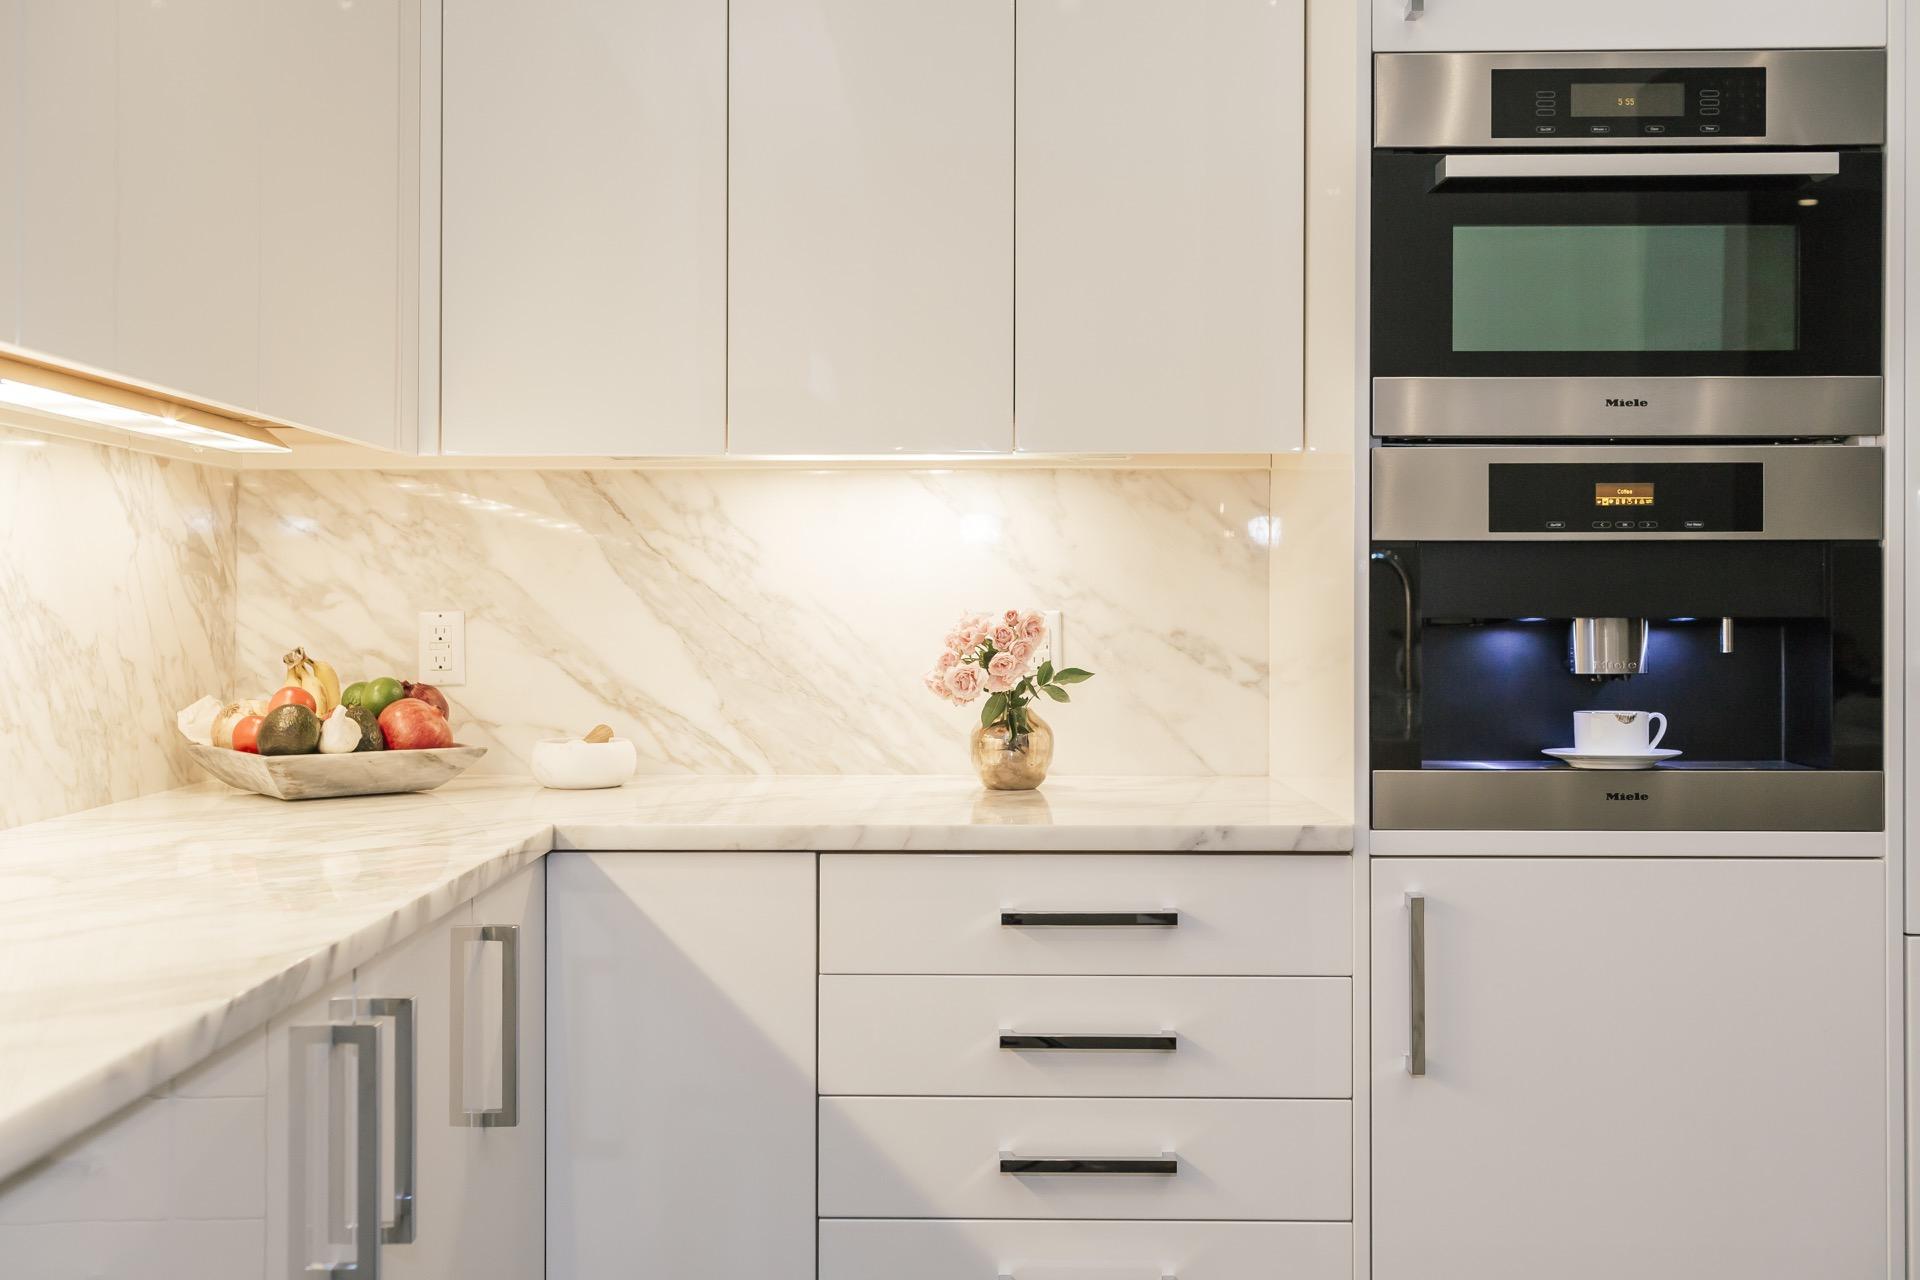 Tara shaw interior design new orleans contemporary for Kitchen design 70115